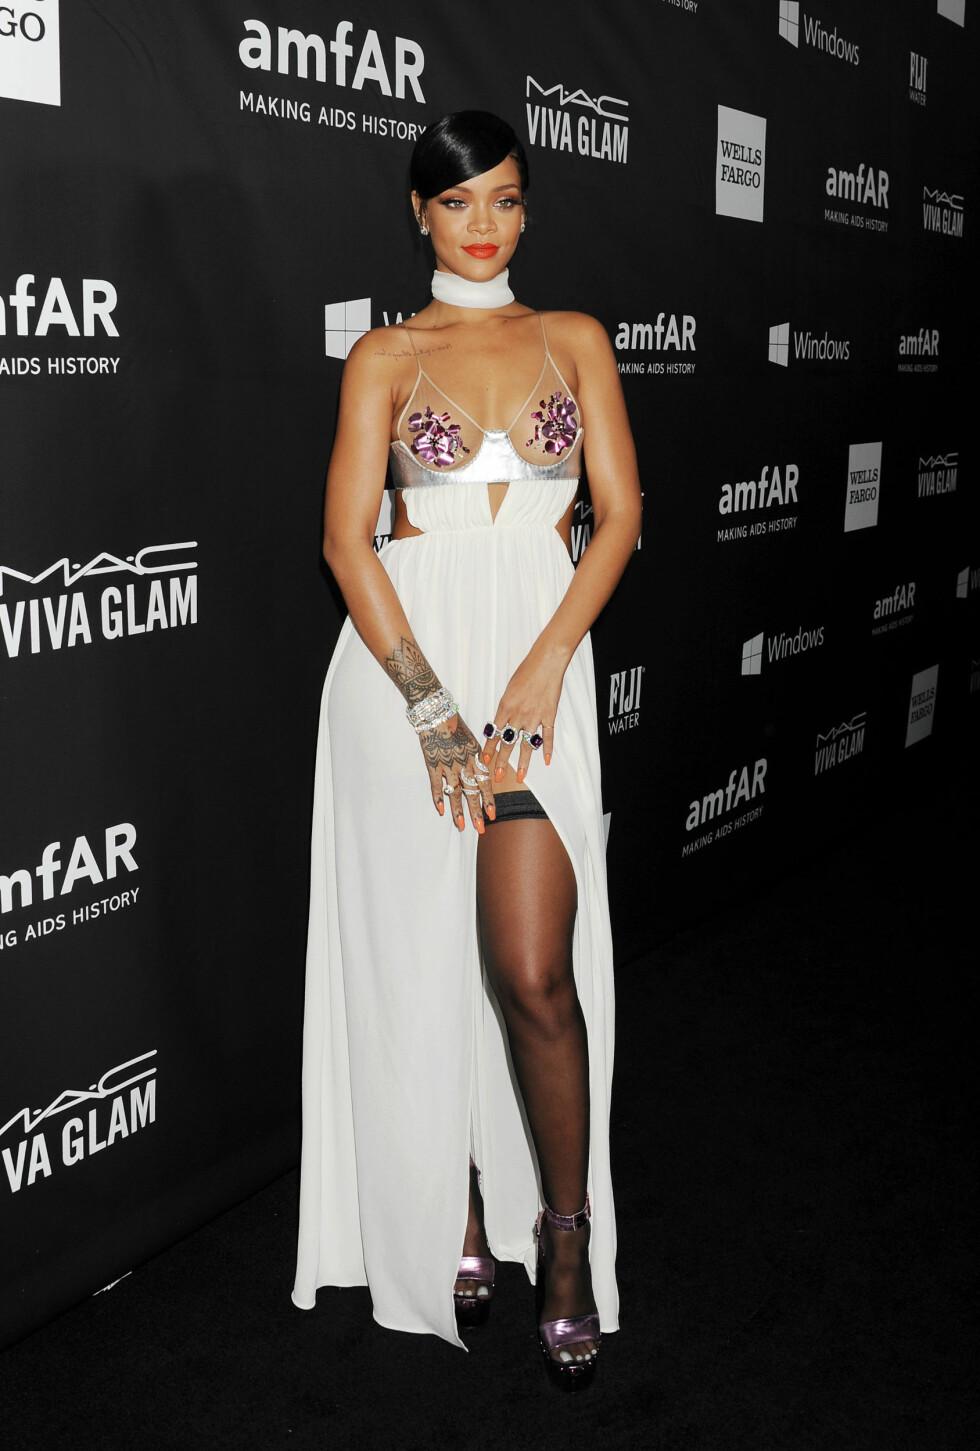 VÅGAL: Rihanna var også svært lettkledd på amfAR-gallaen. Hun viste både lår, midje og brystparti i denne Tom Ford-kreasjonen - som sikret henne terningkast to. Foto: Stella Pictures